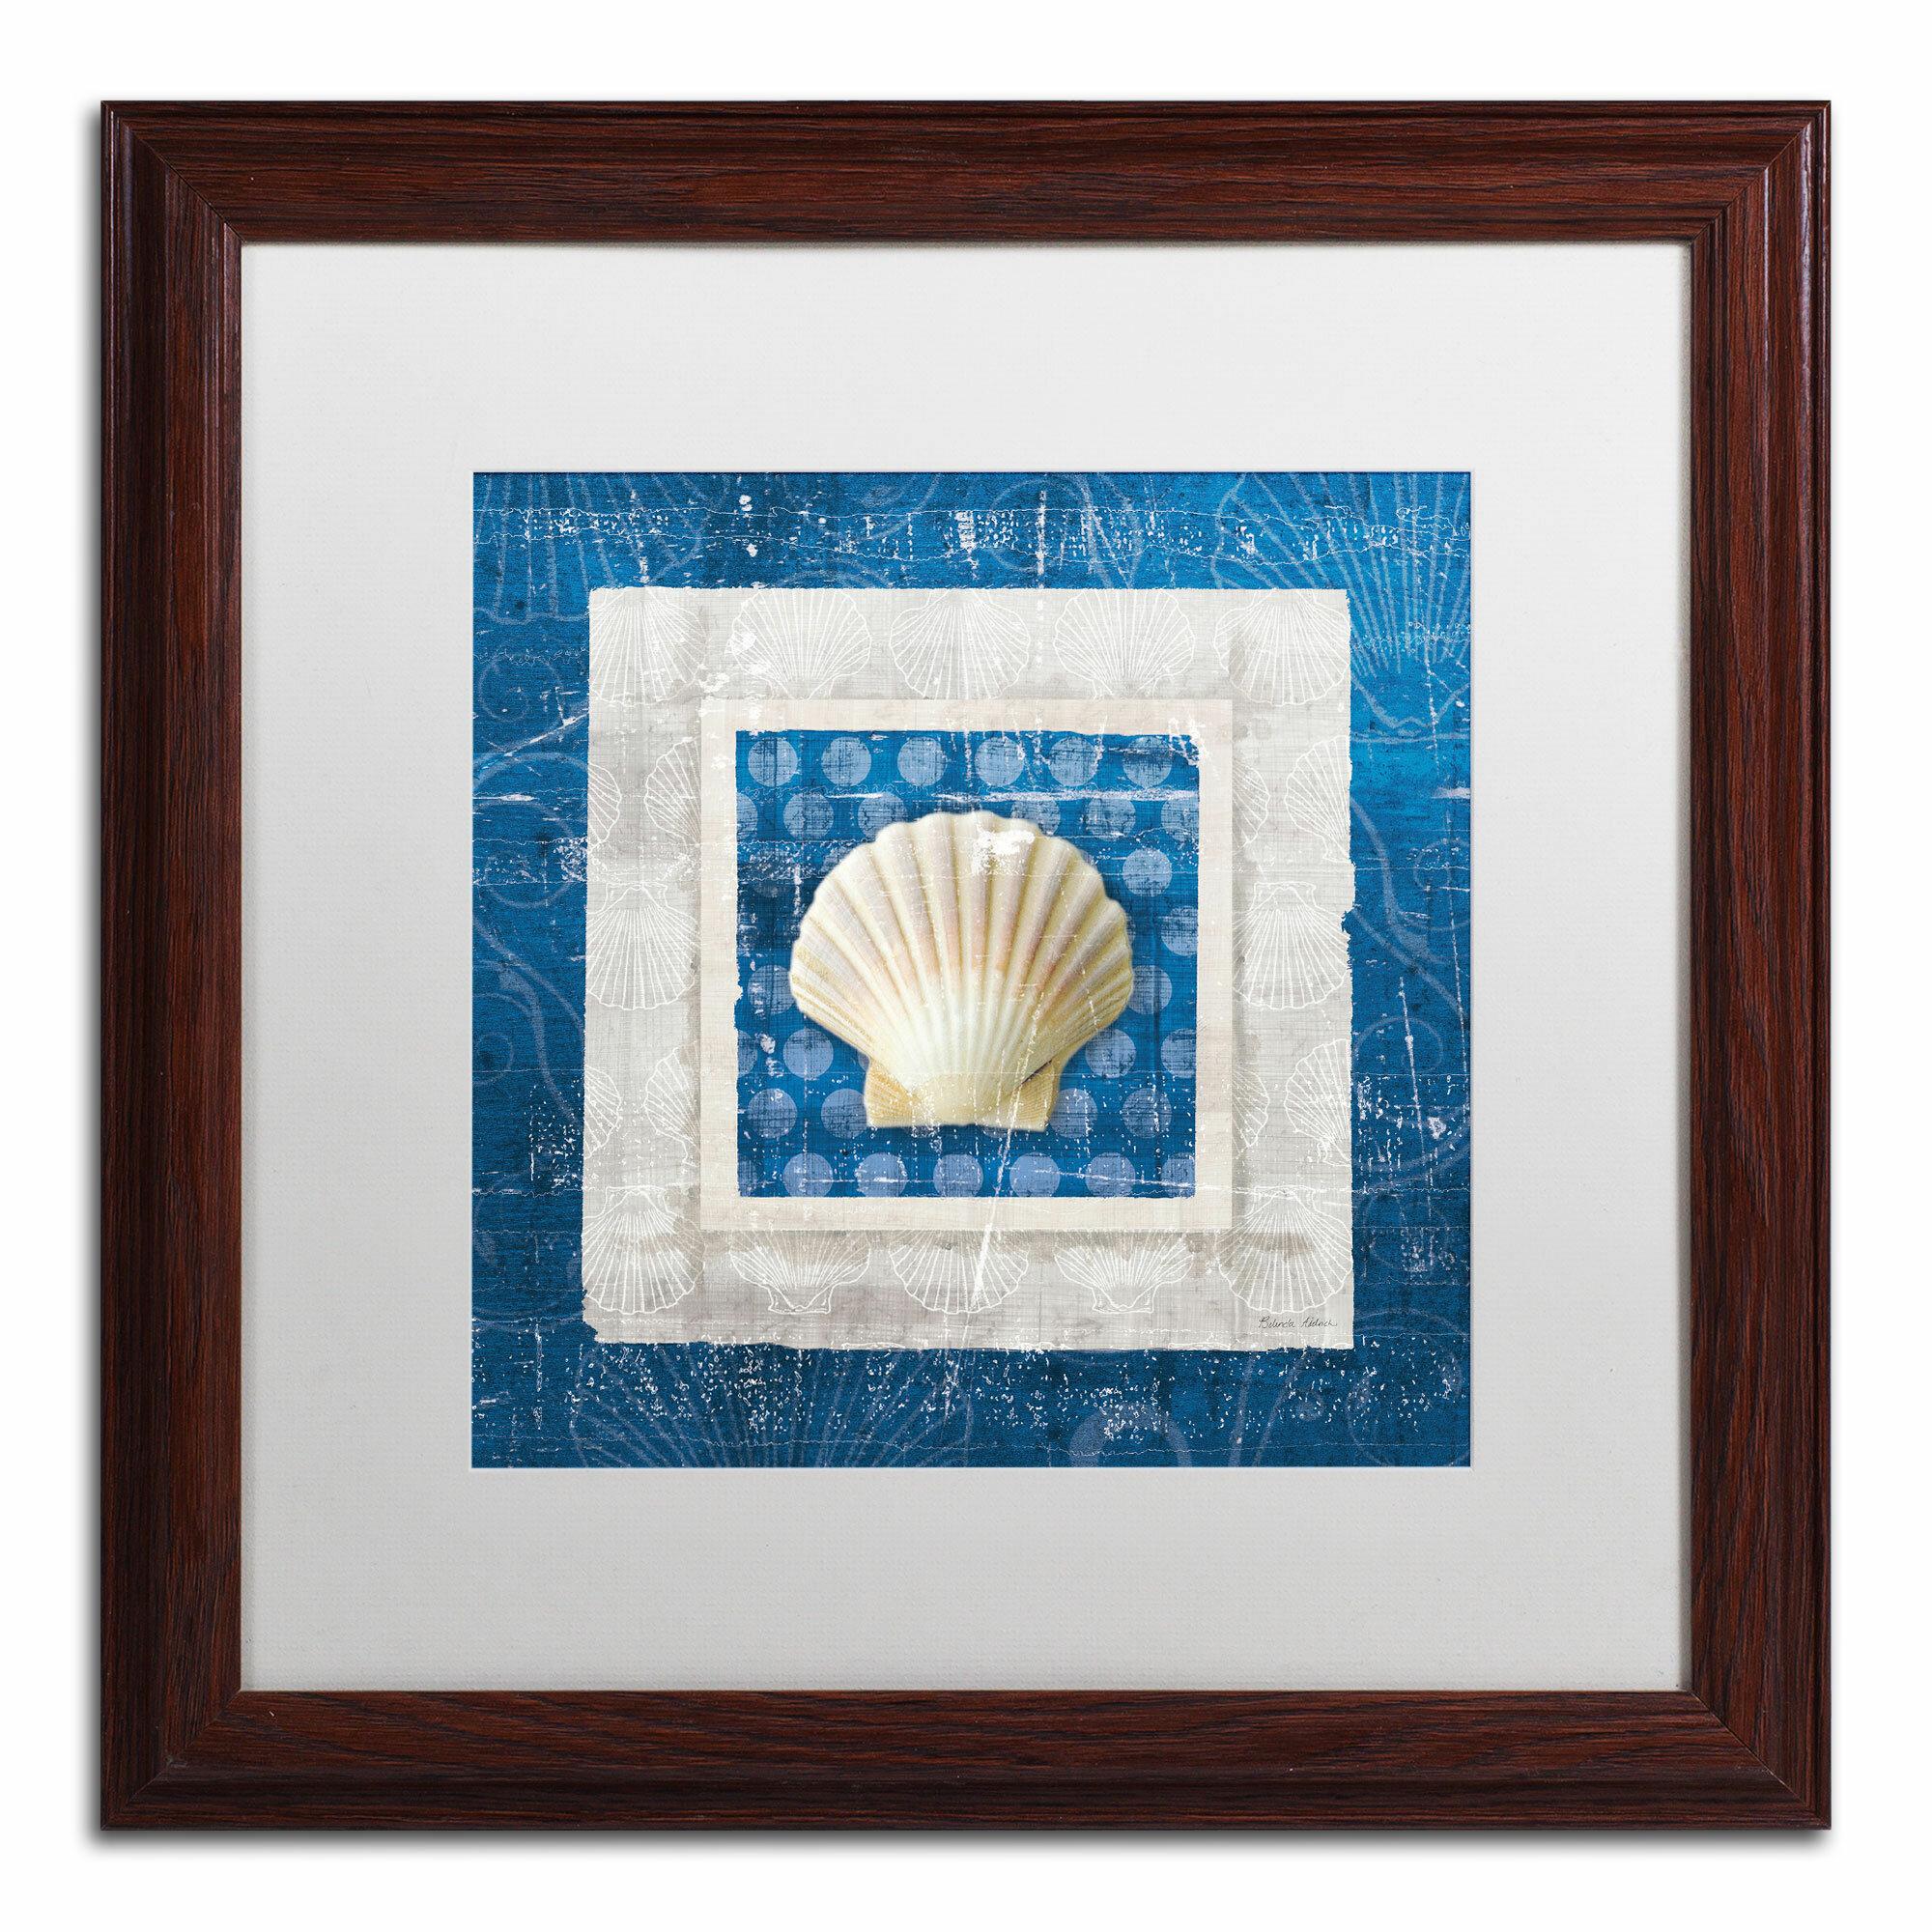 Trademark Art Sea Shell Iii On Blue By Belinda Aldrich Framed Graphic Art Wayfair